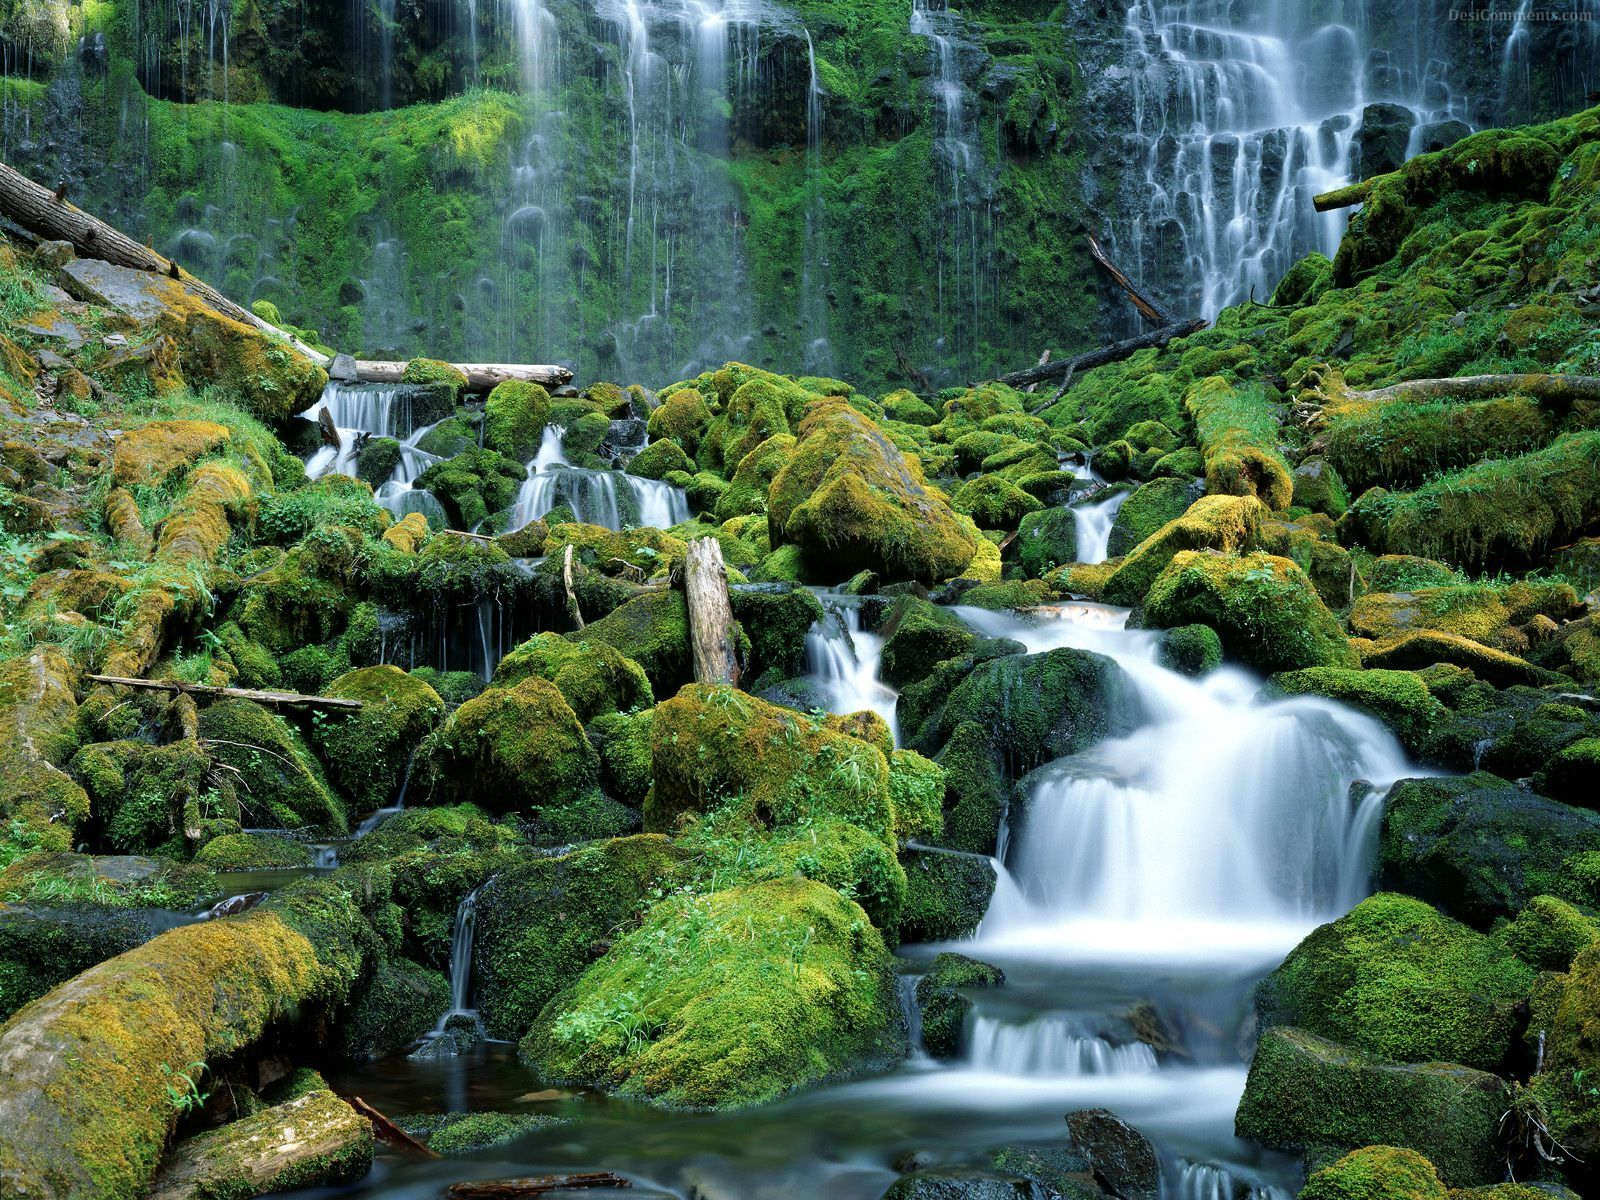 Waterfall Wallpaper 87 1600x1200